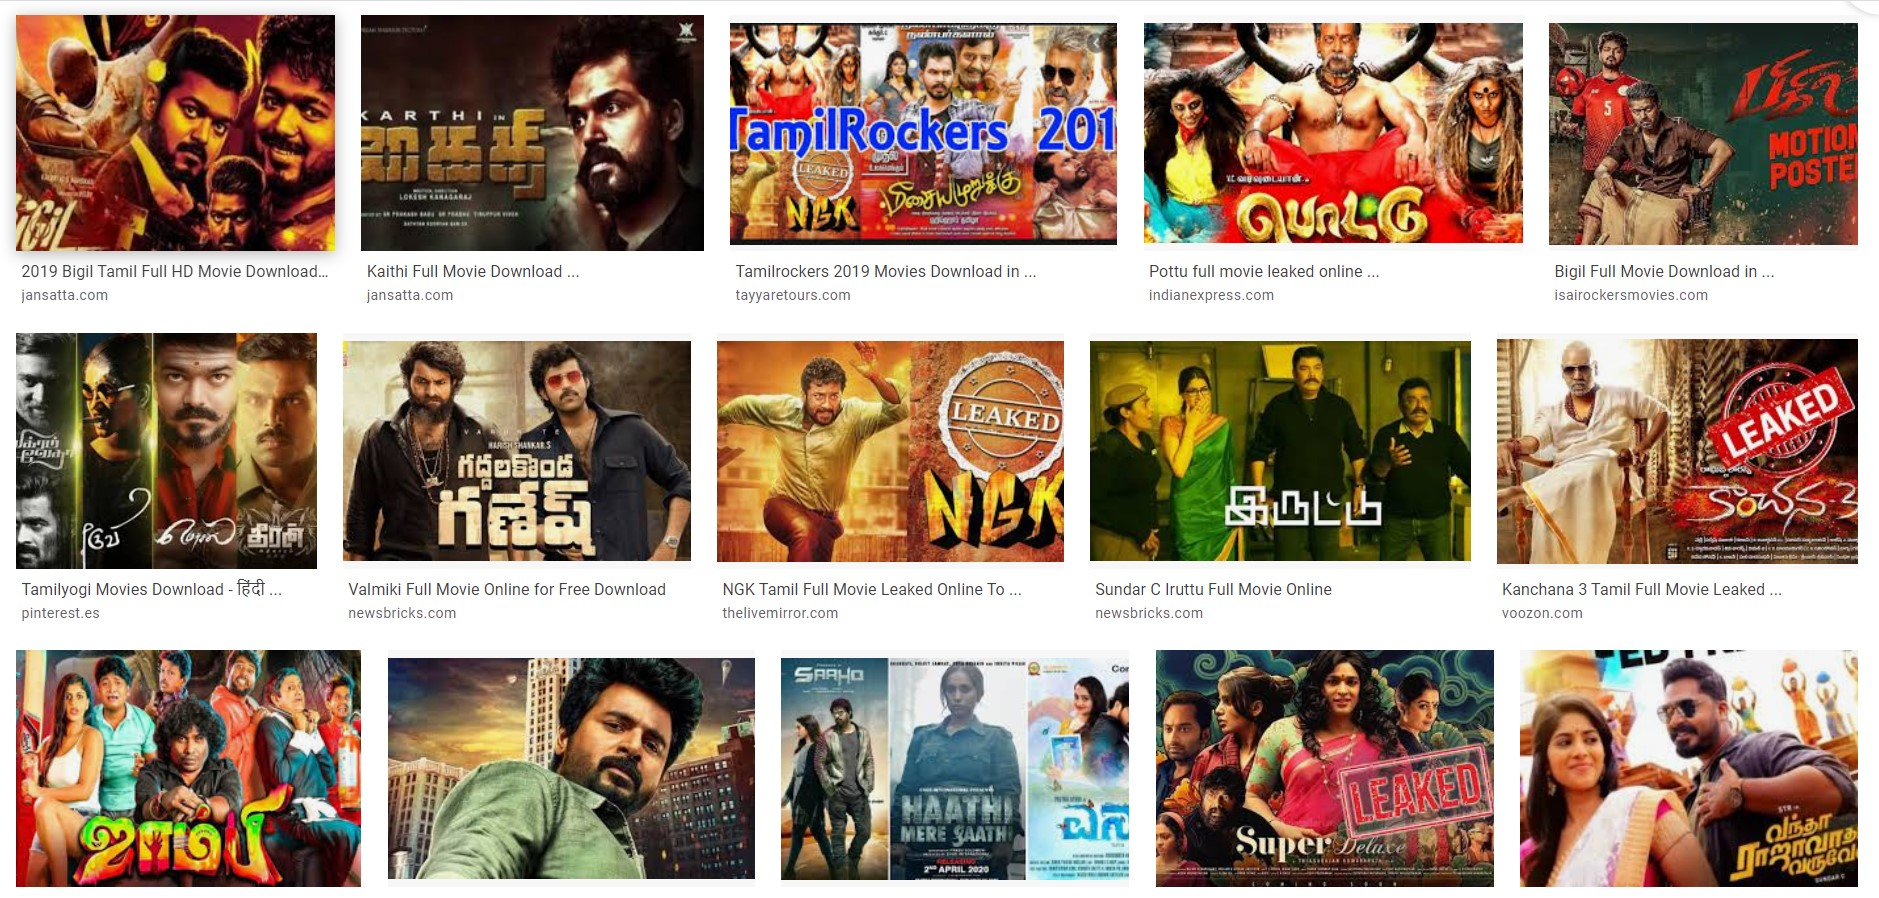 Tamilrockers 2019 Tamil movies download